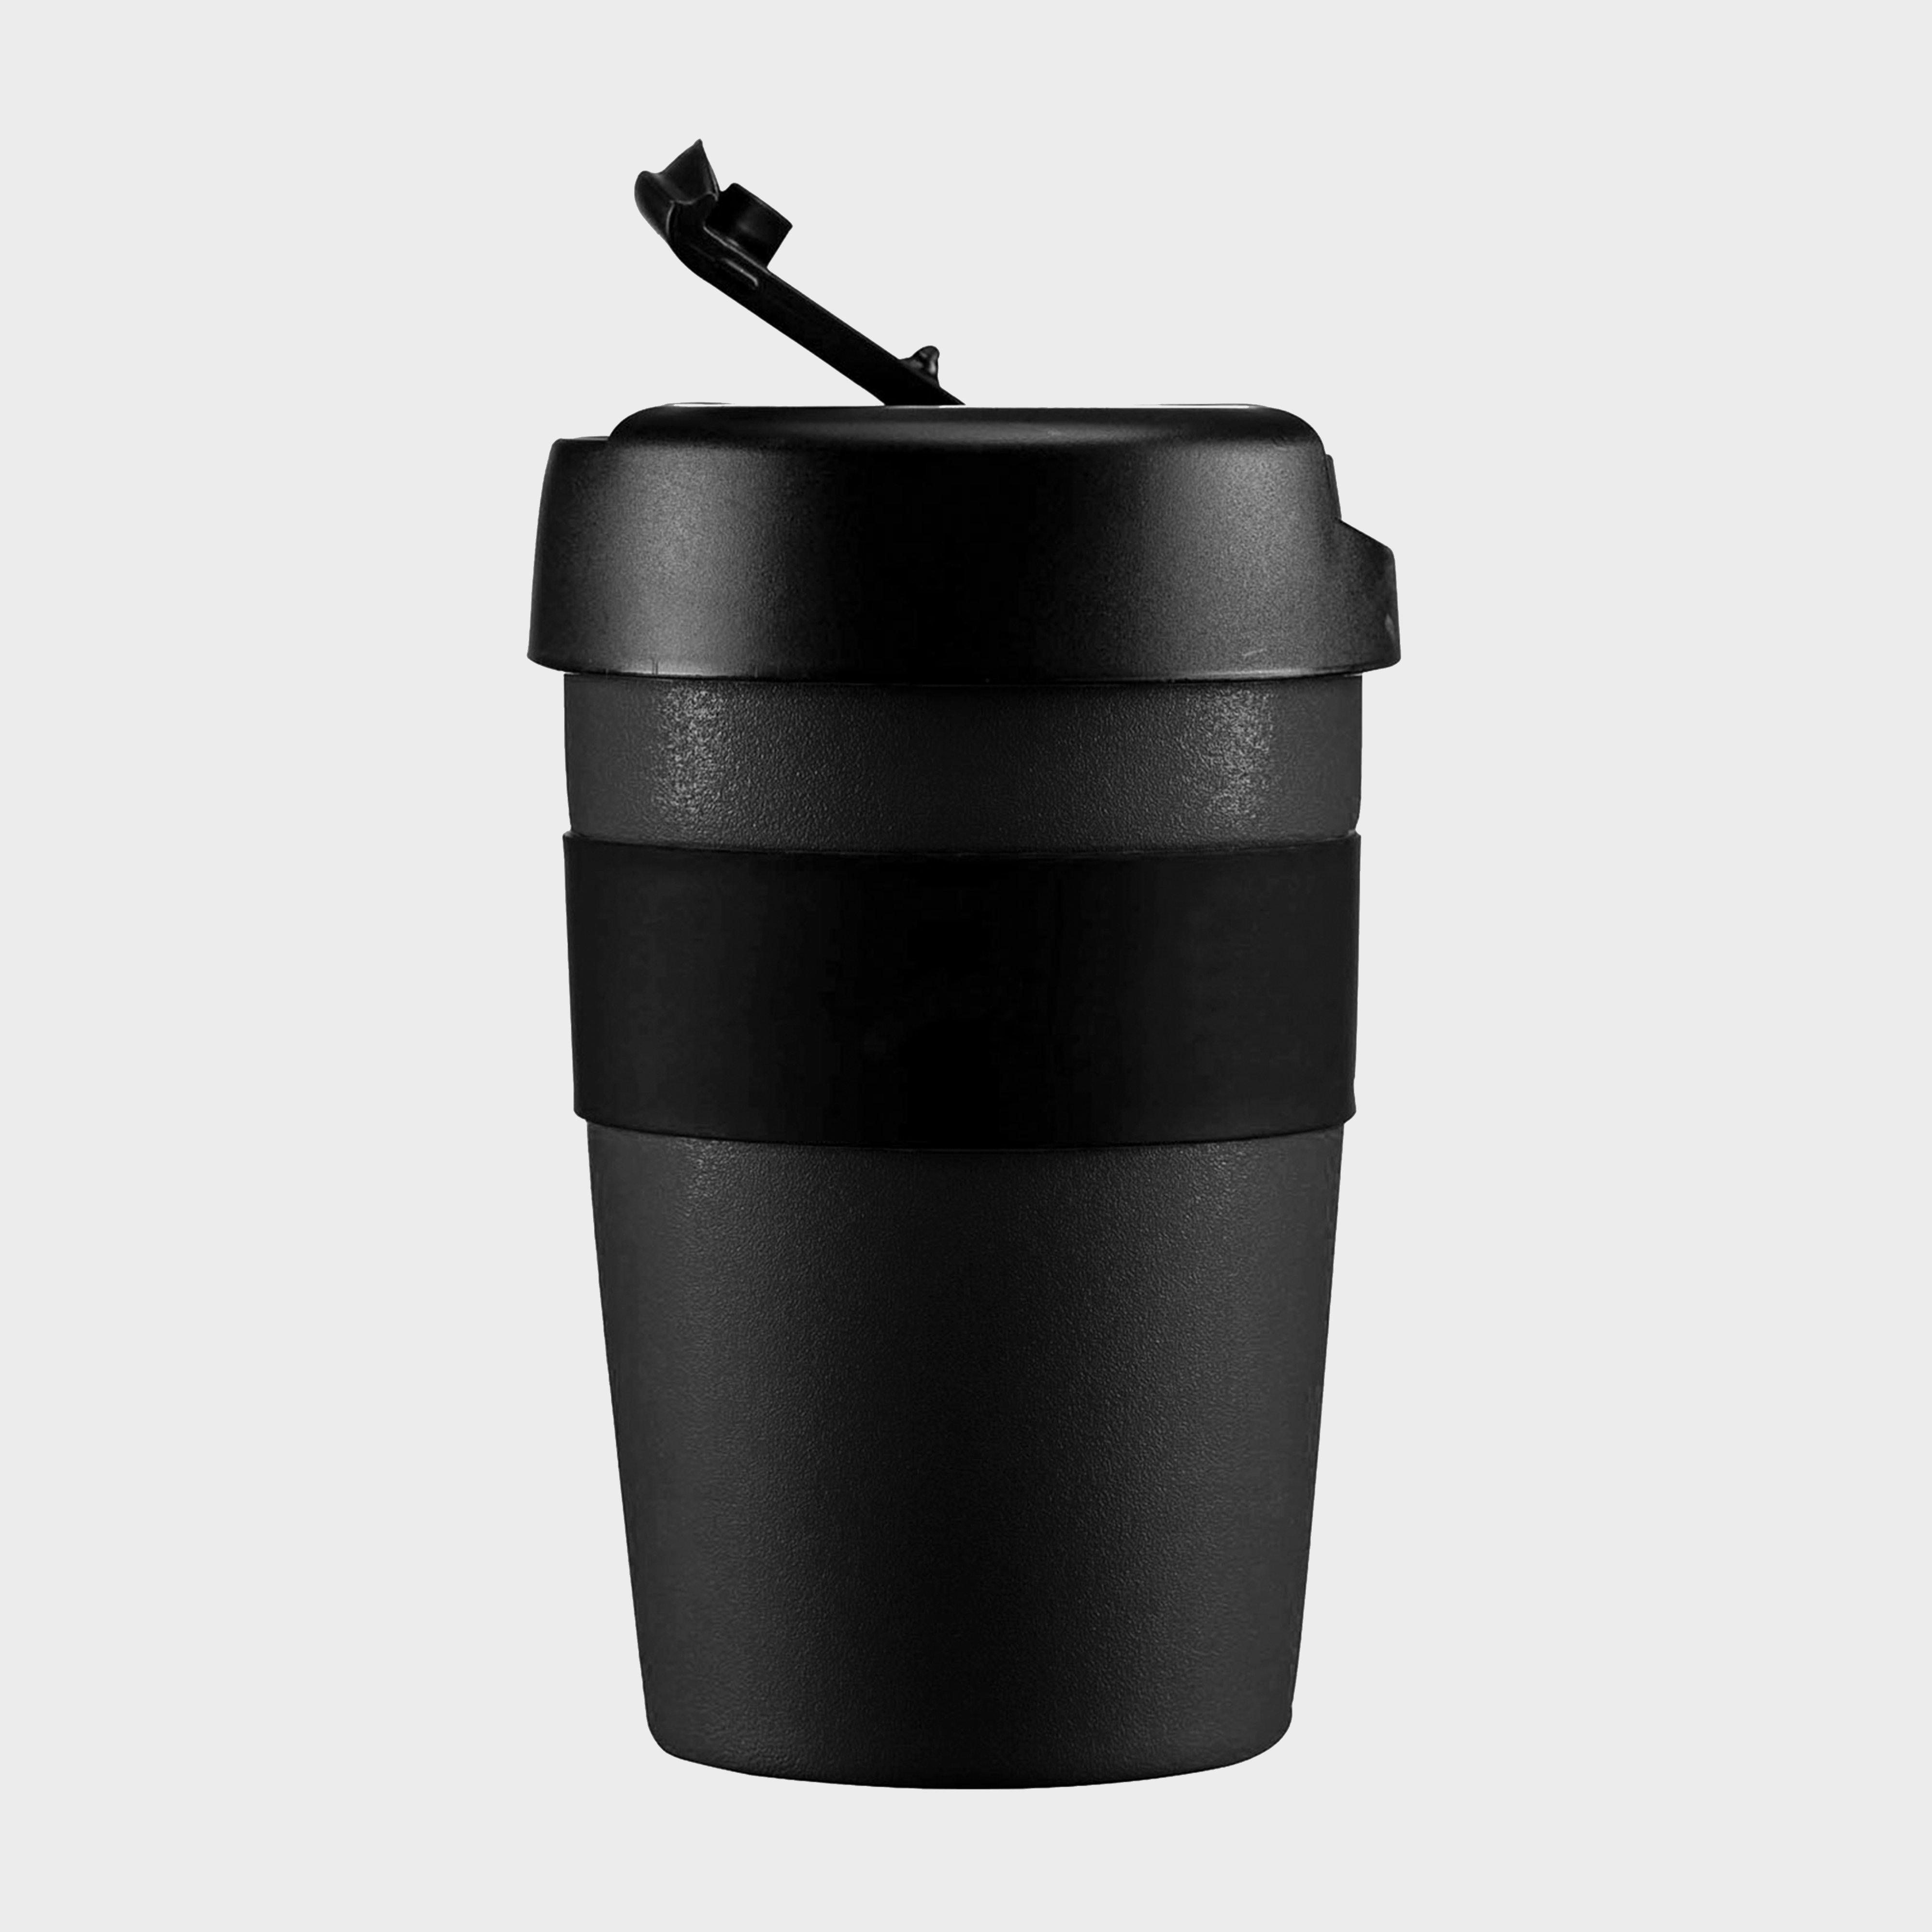 Lifeventure Lifeventure Reusable Coffee Cup 350ml - Black, Black